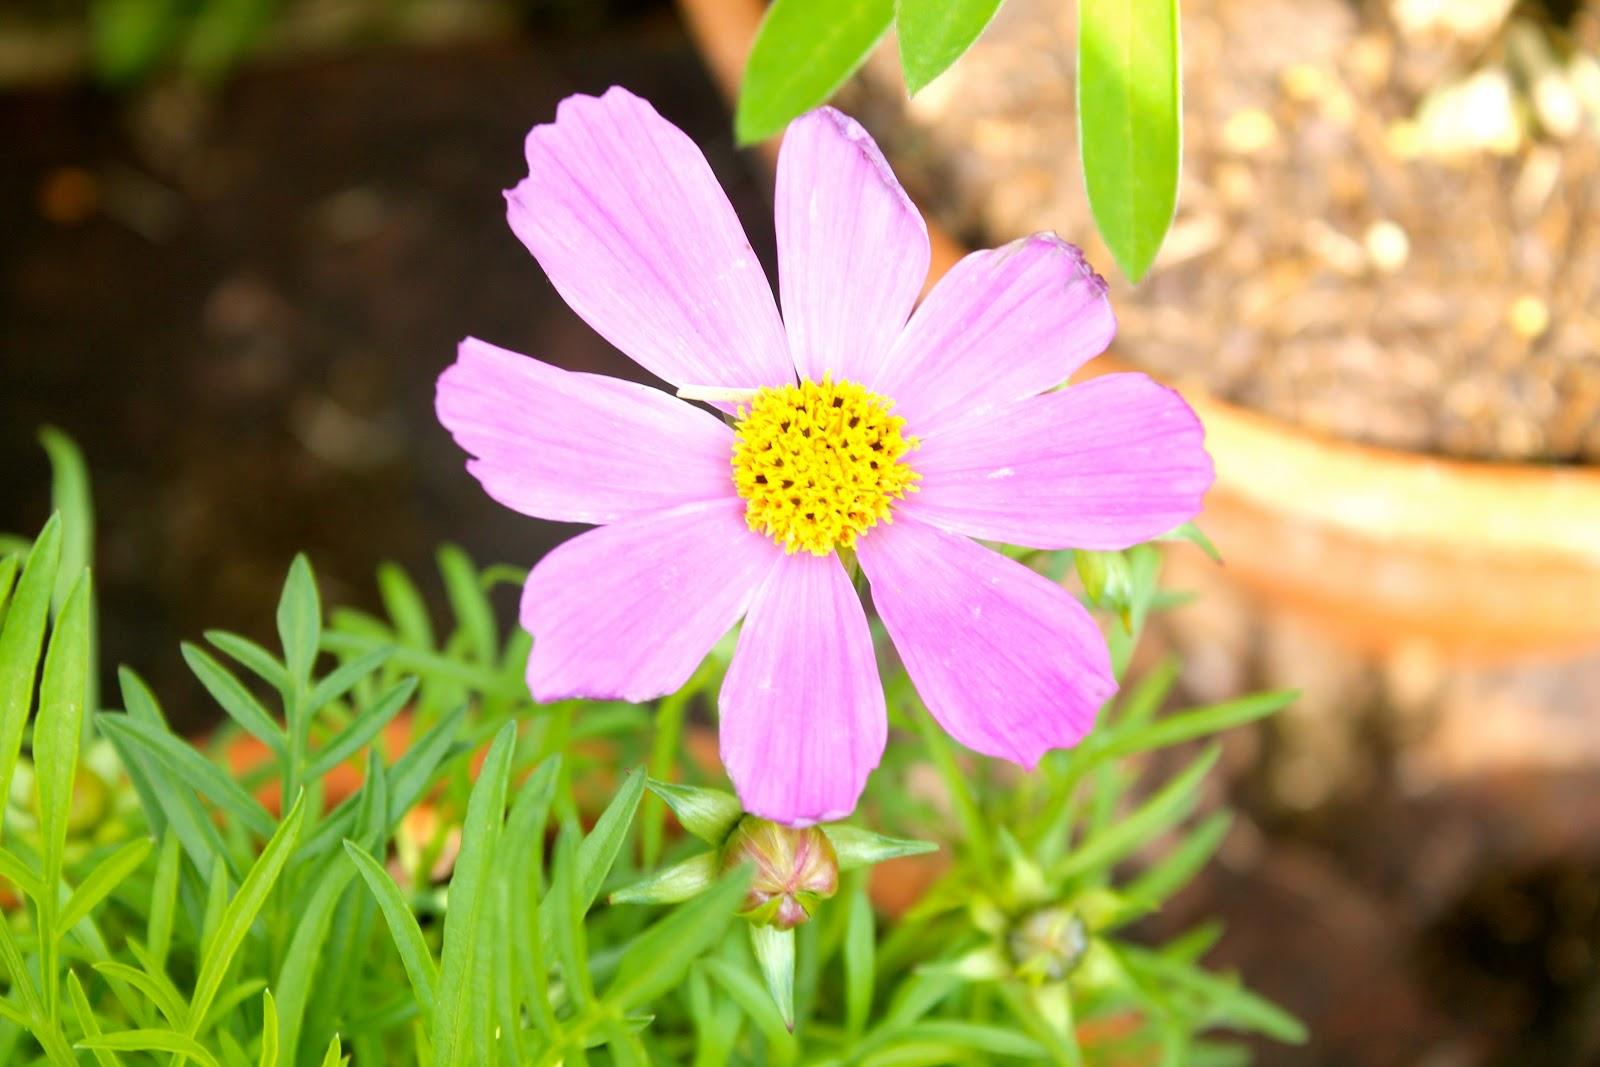 Anniversaries, Unaniversaries and Flowers!